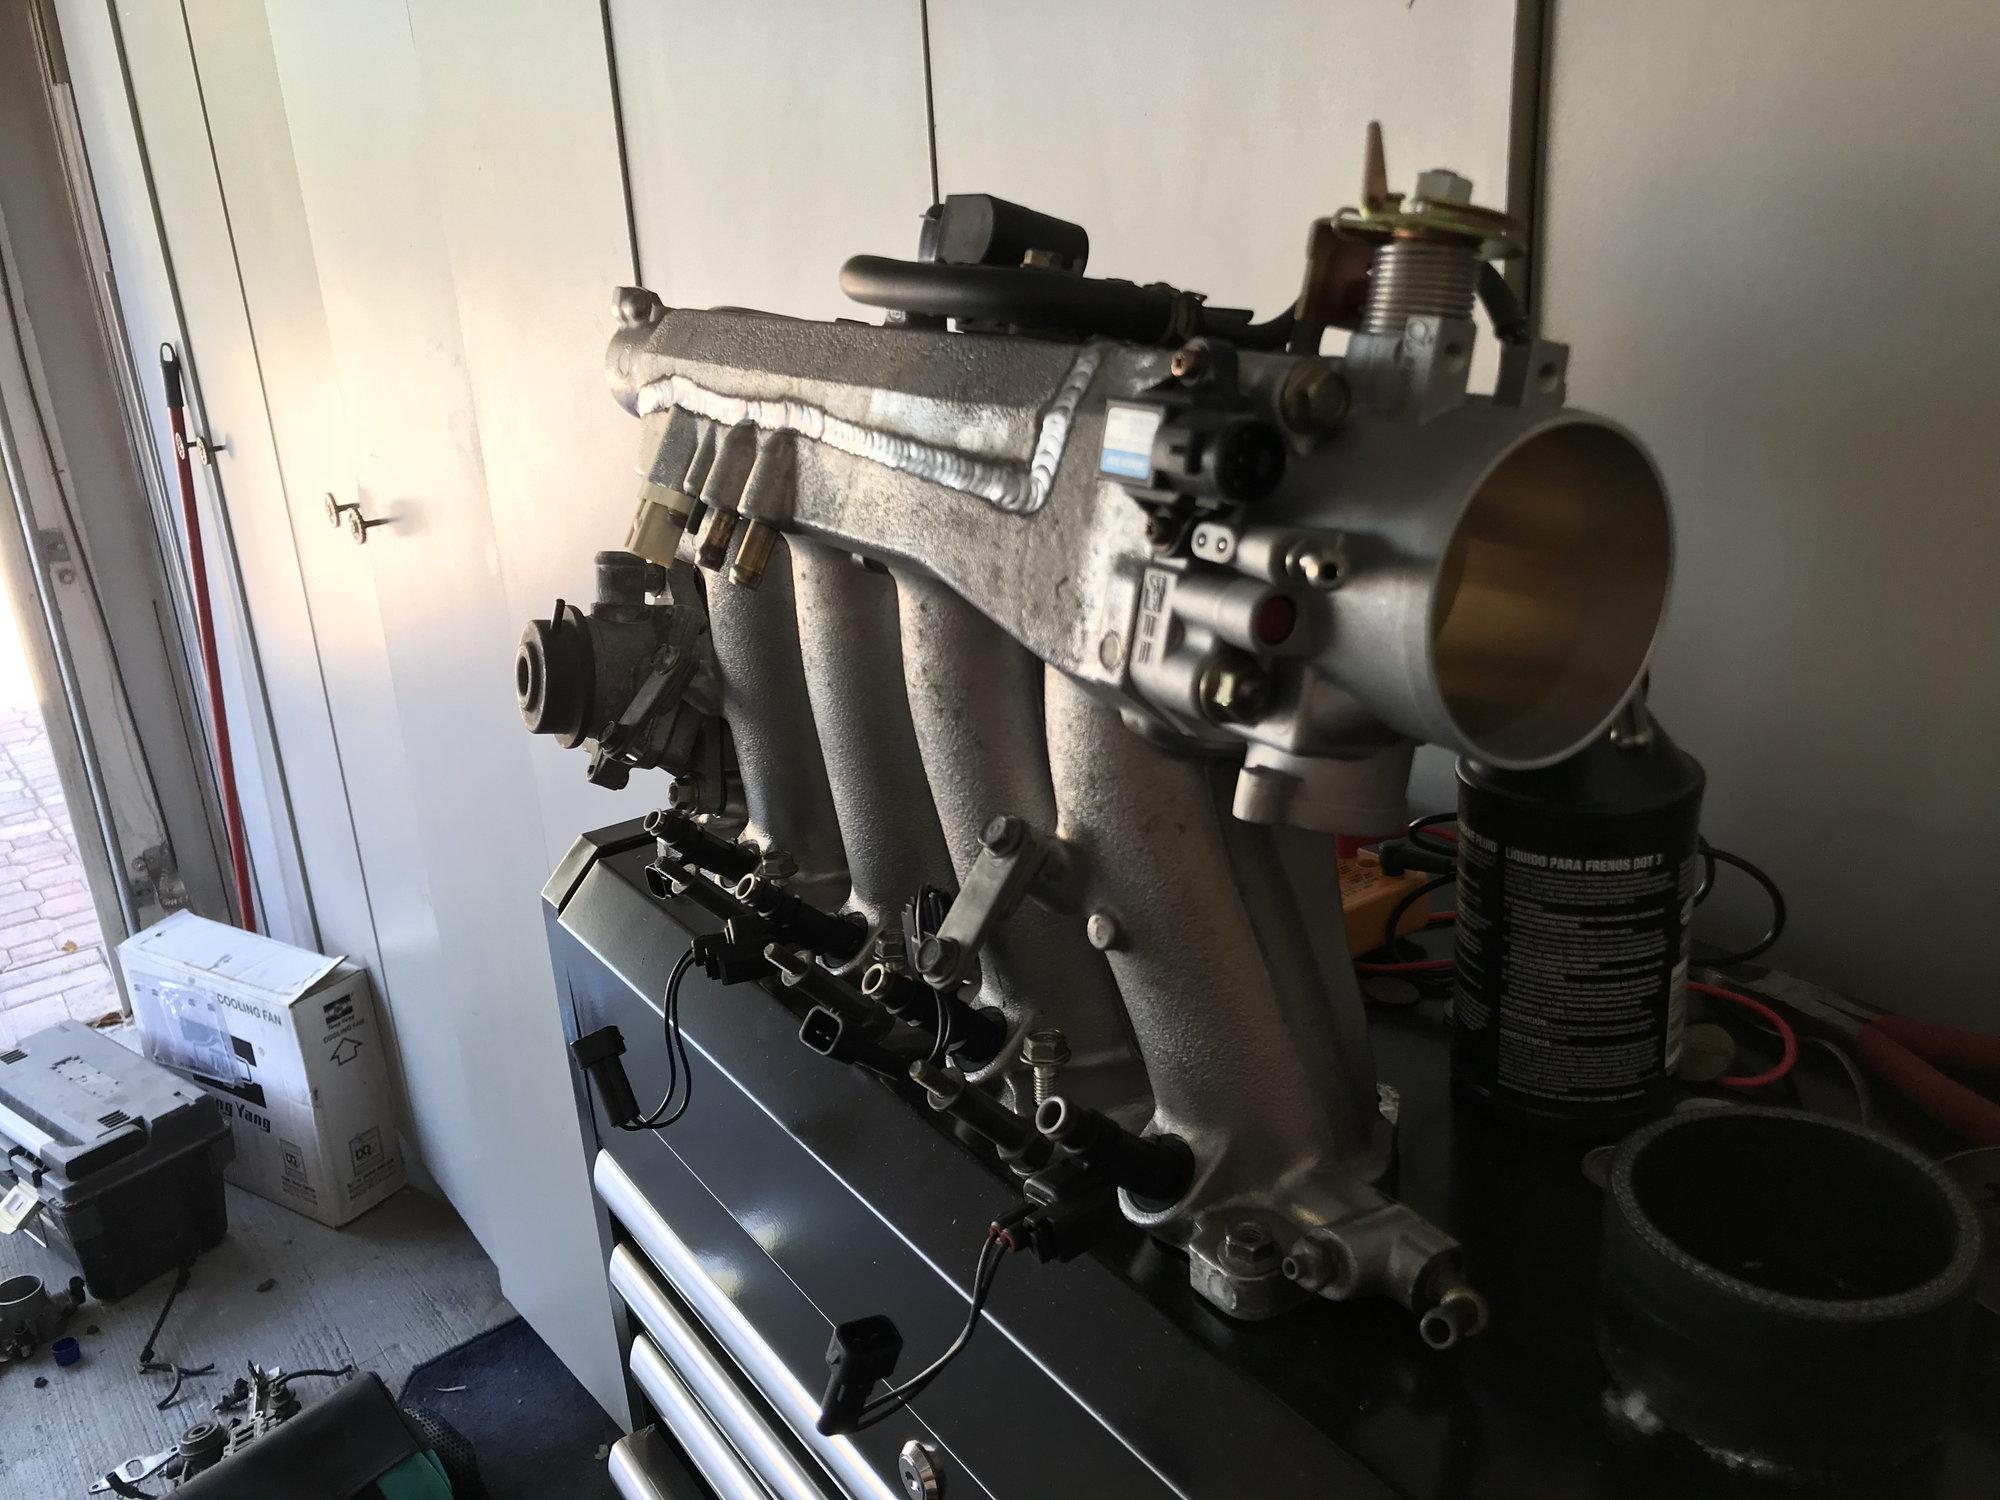 Ported oem intake manifold - S2KI Honda S2000 Forums